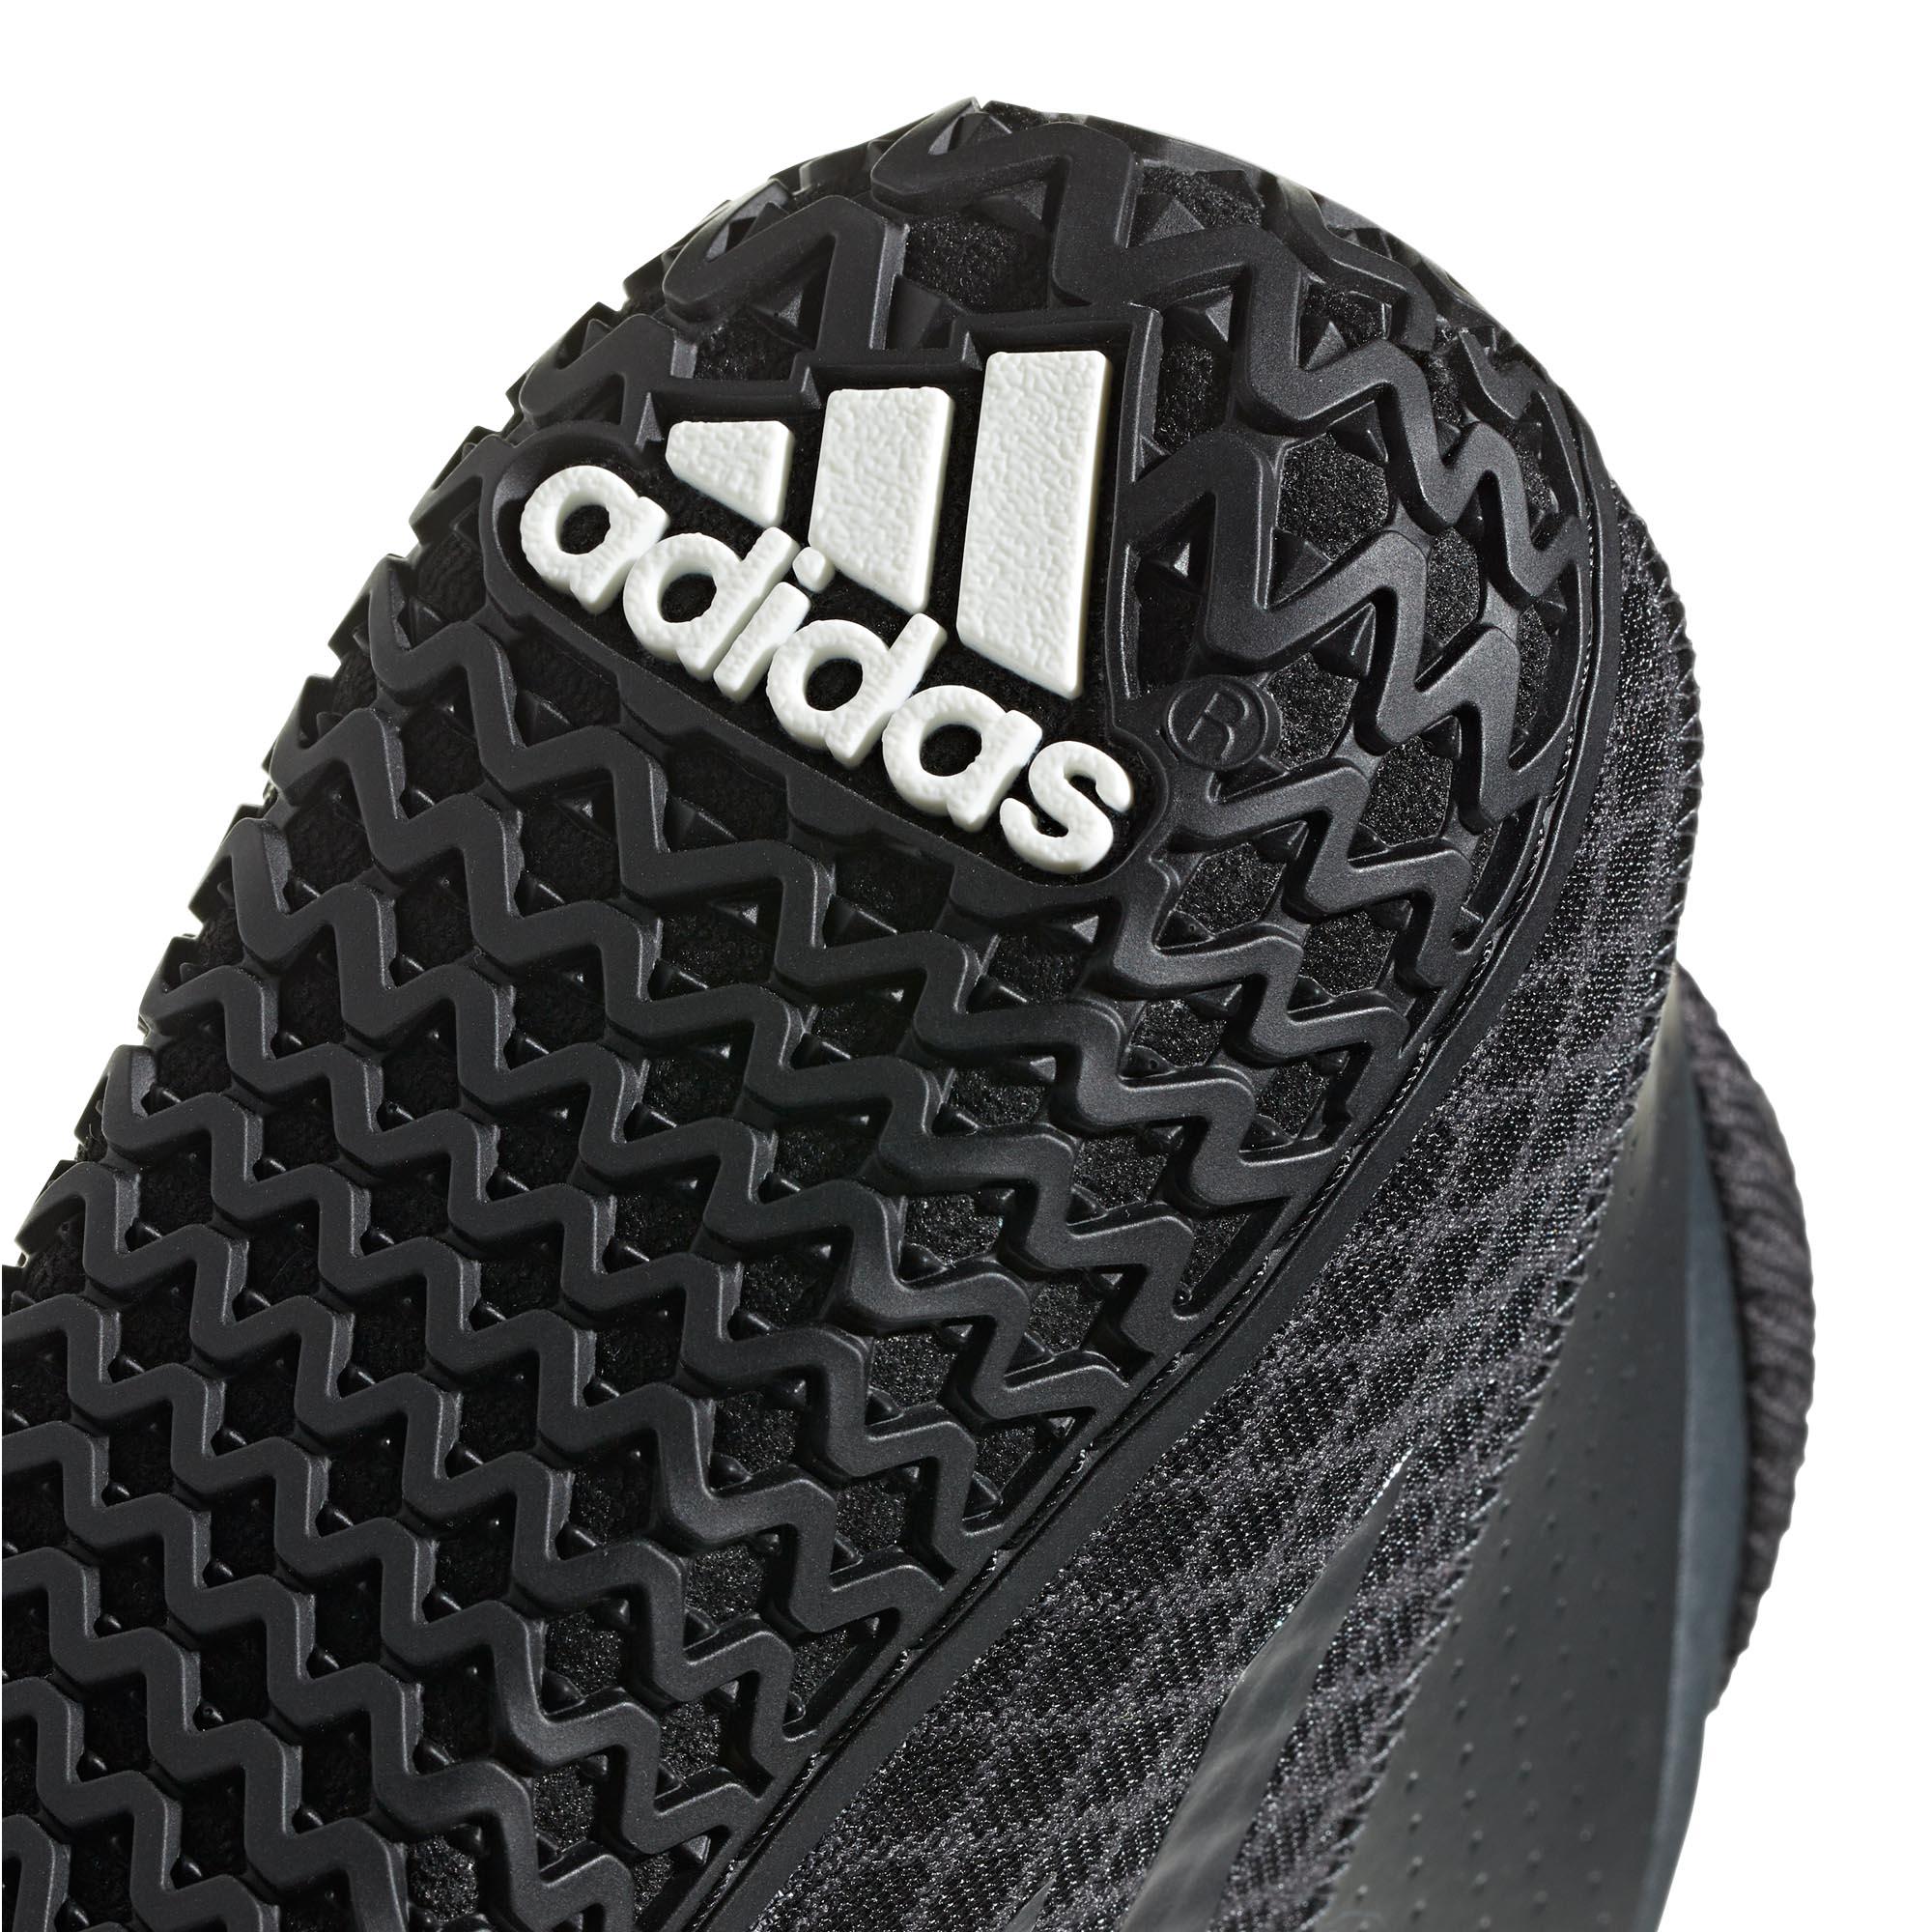 miniature 10 - Adidas Mat Wizard 4 homme adulte lutte Trainer Shoe Boot Noir